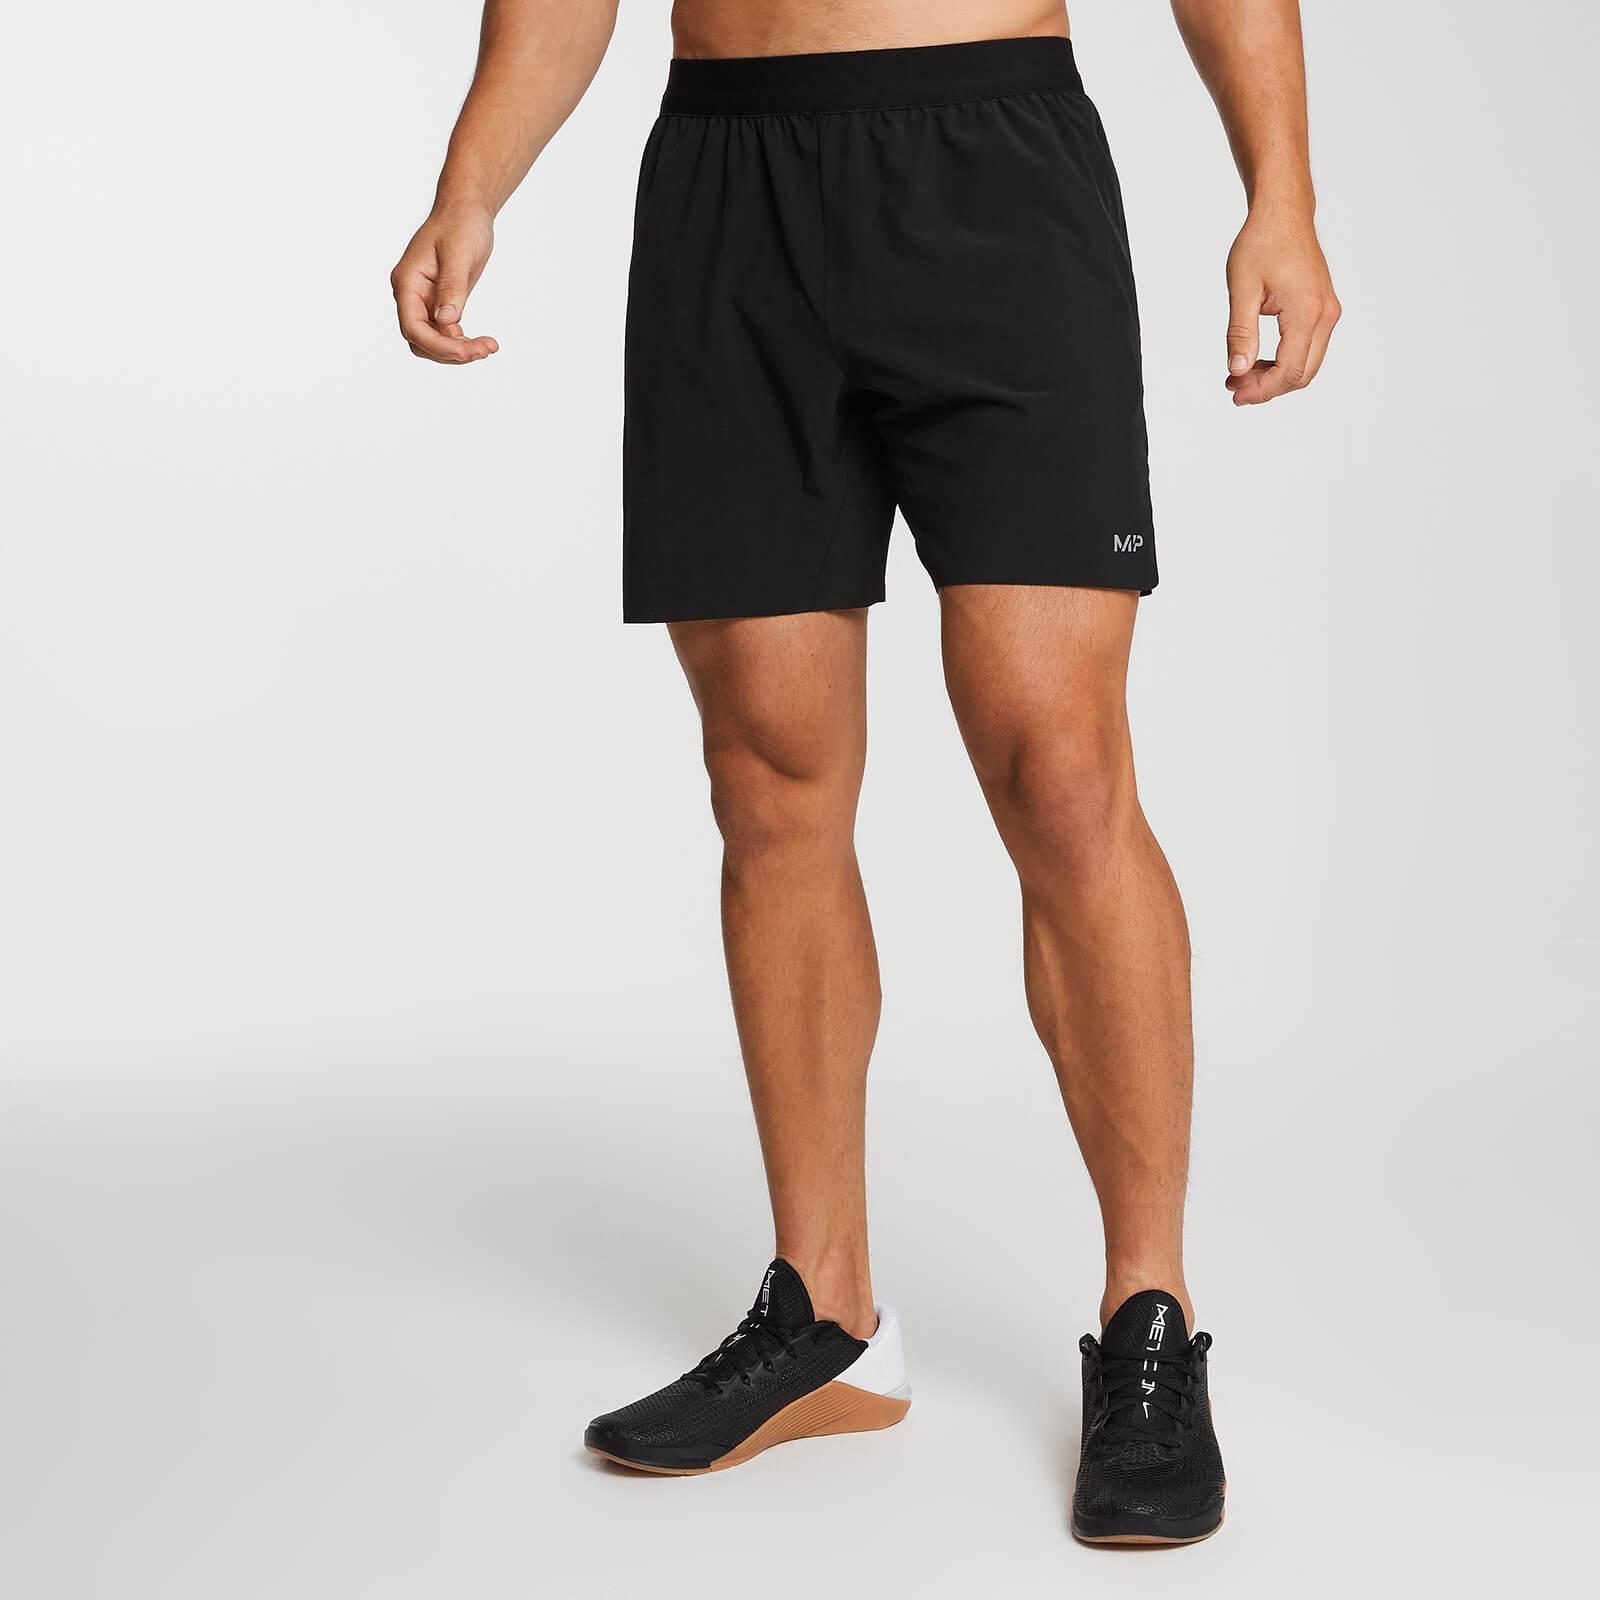 MP Essentials Training Shorts - Sort - S